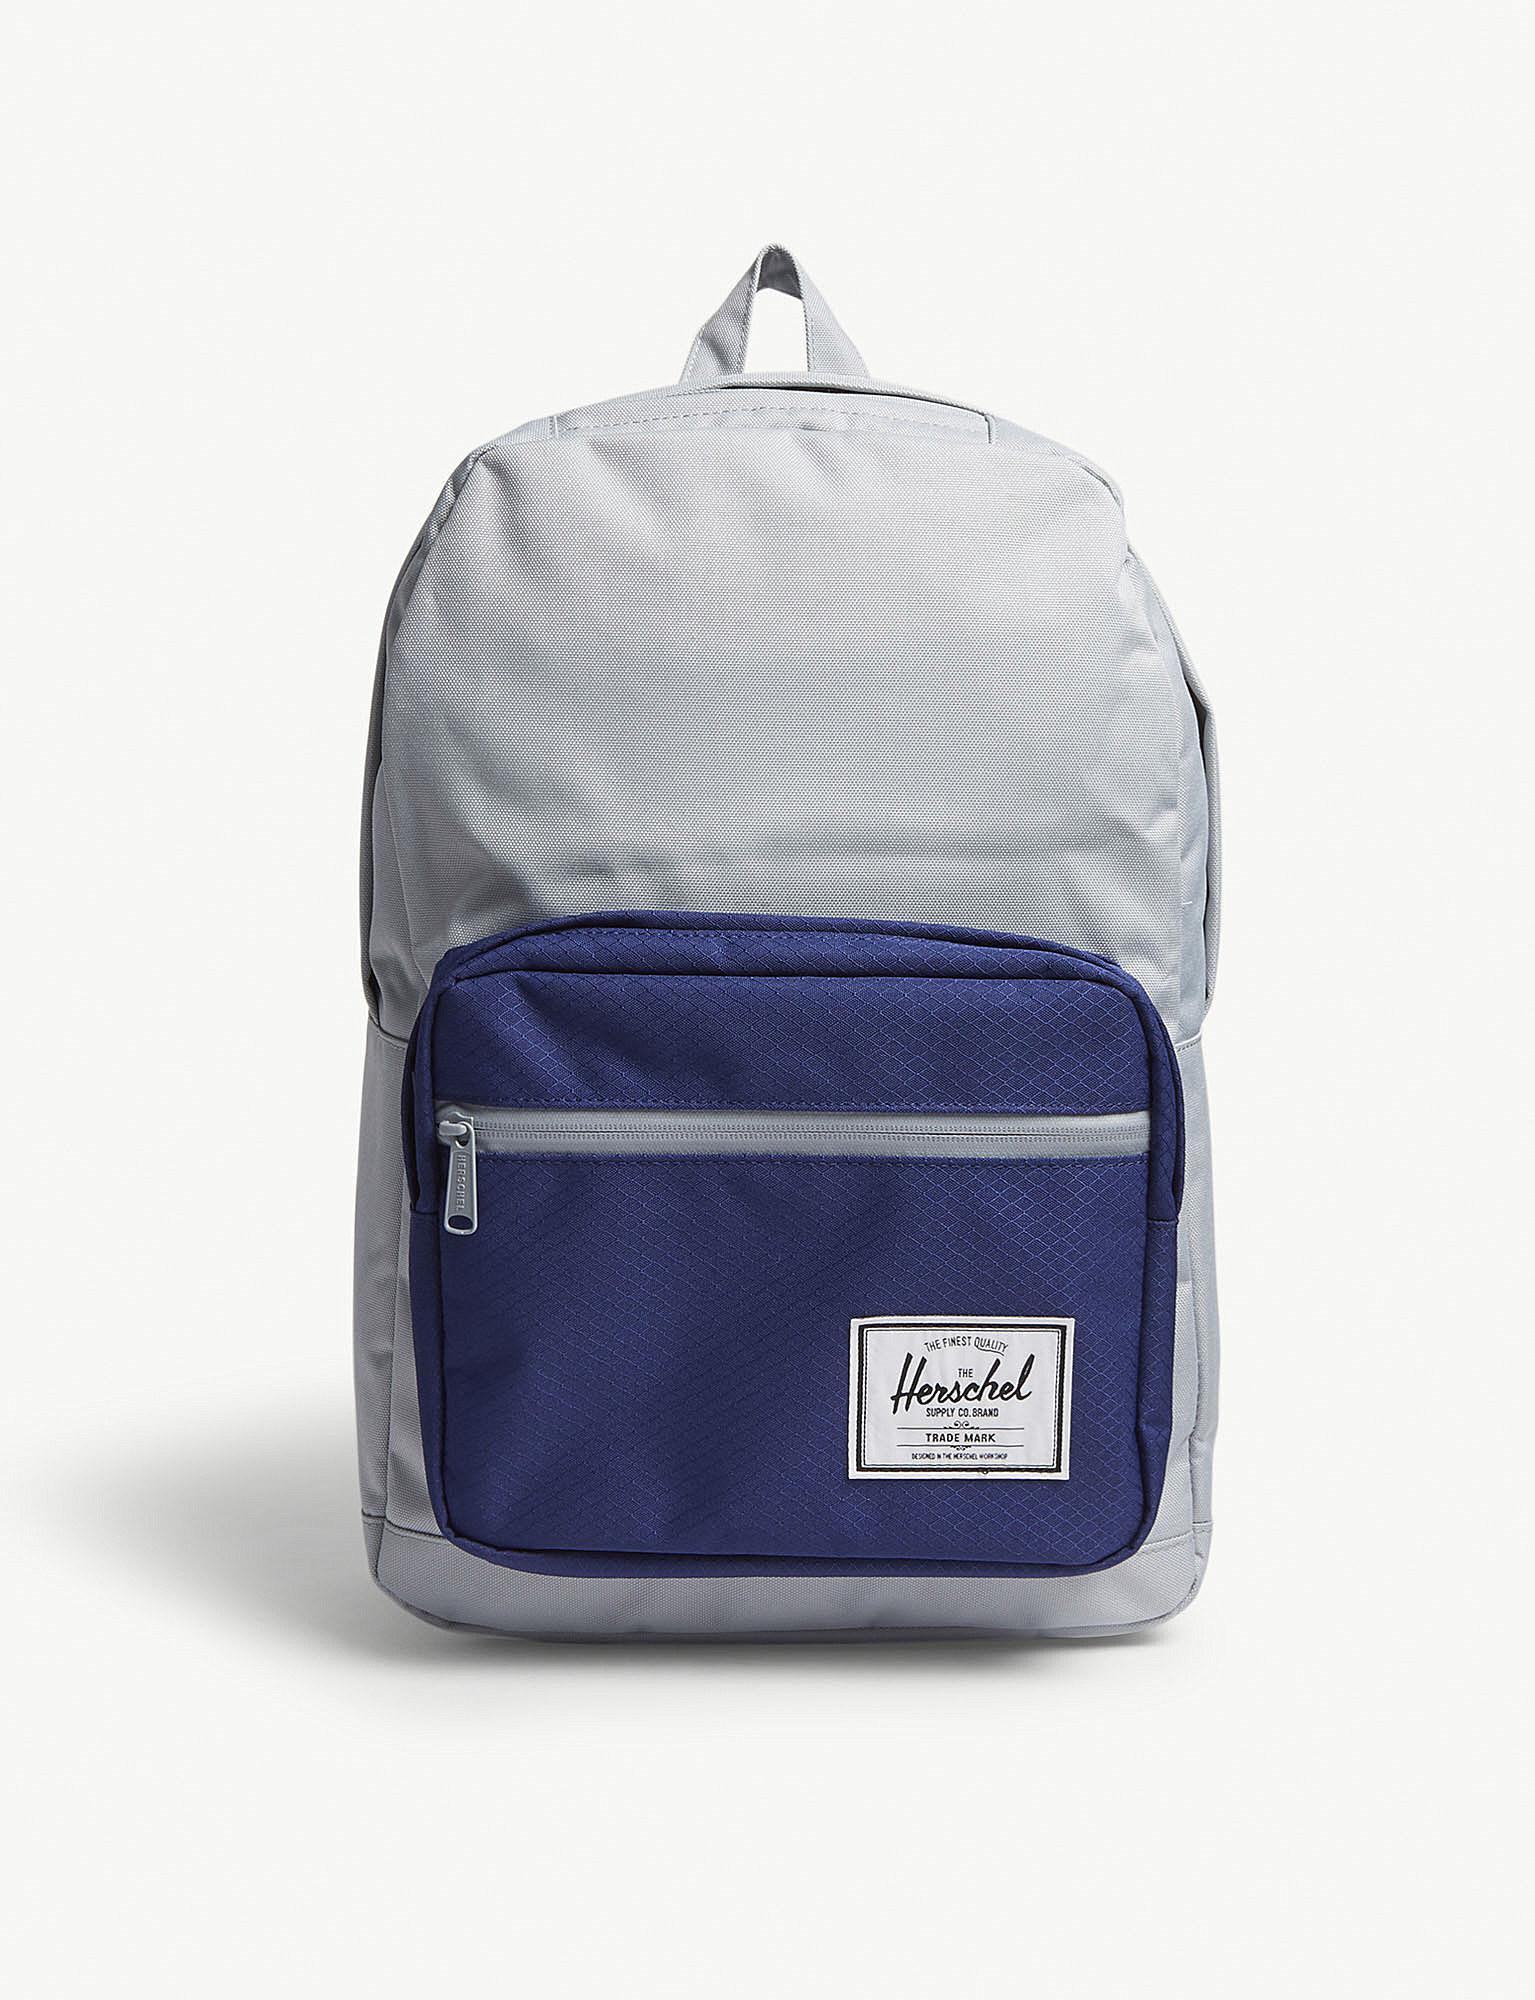 42244ff4b594 Lyst - Herschel Supply Co. Pop Quiz Backpack in Blue for Men